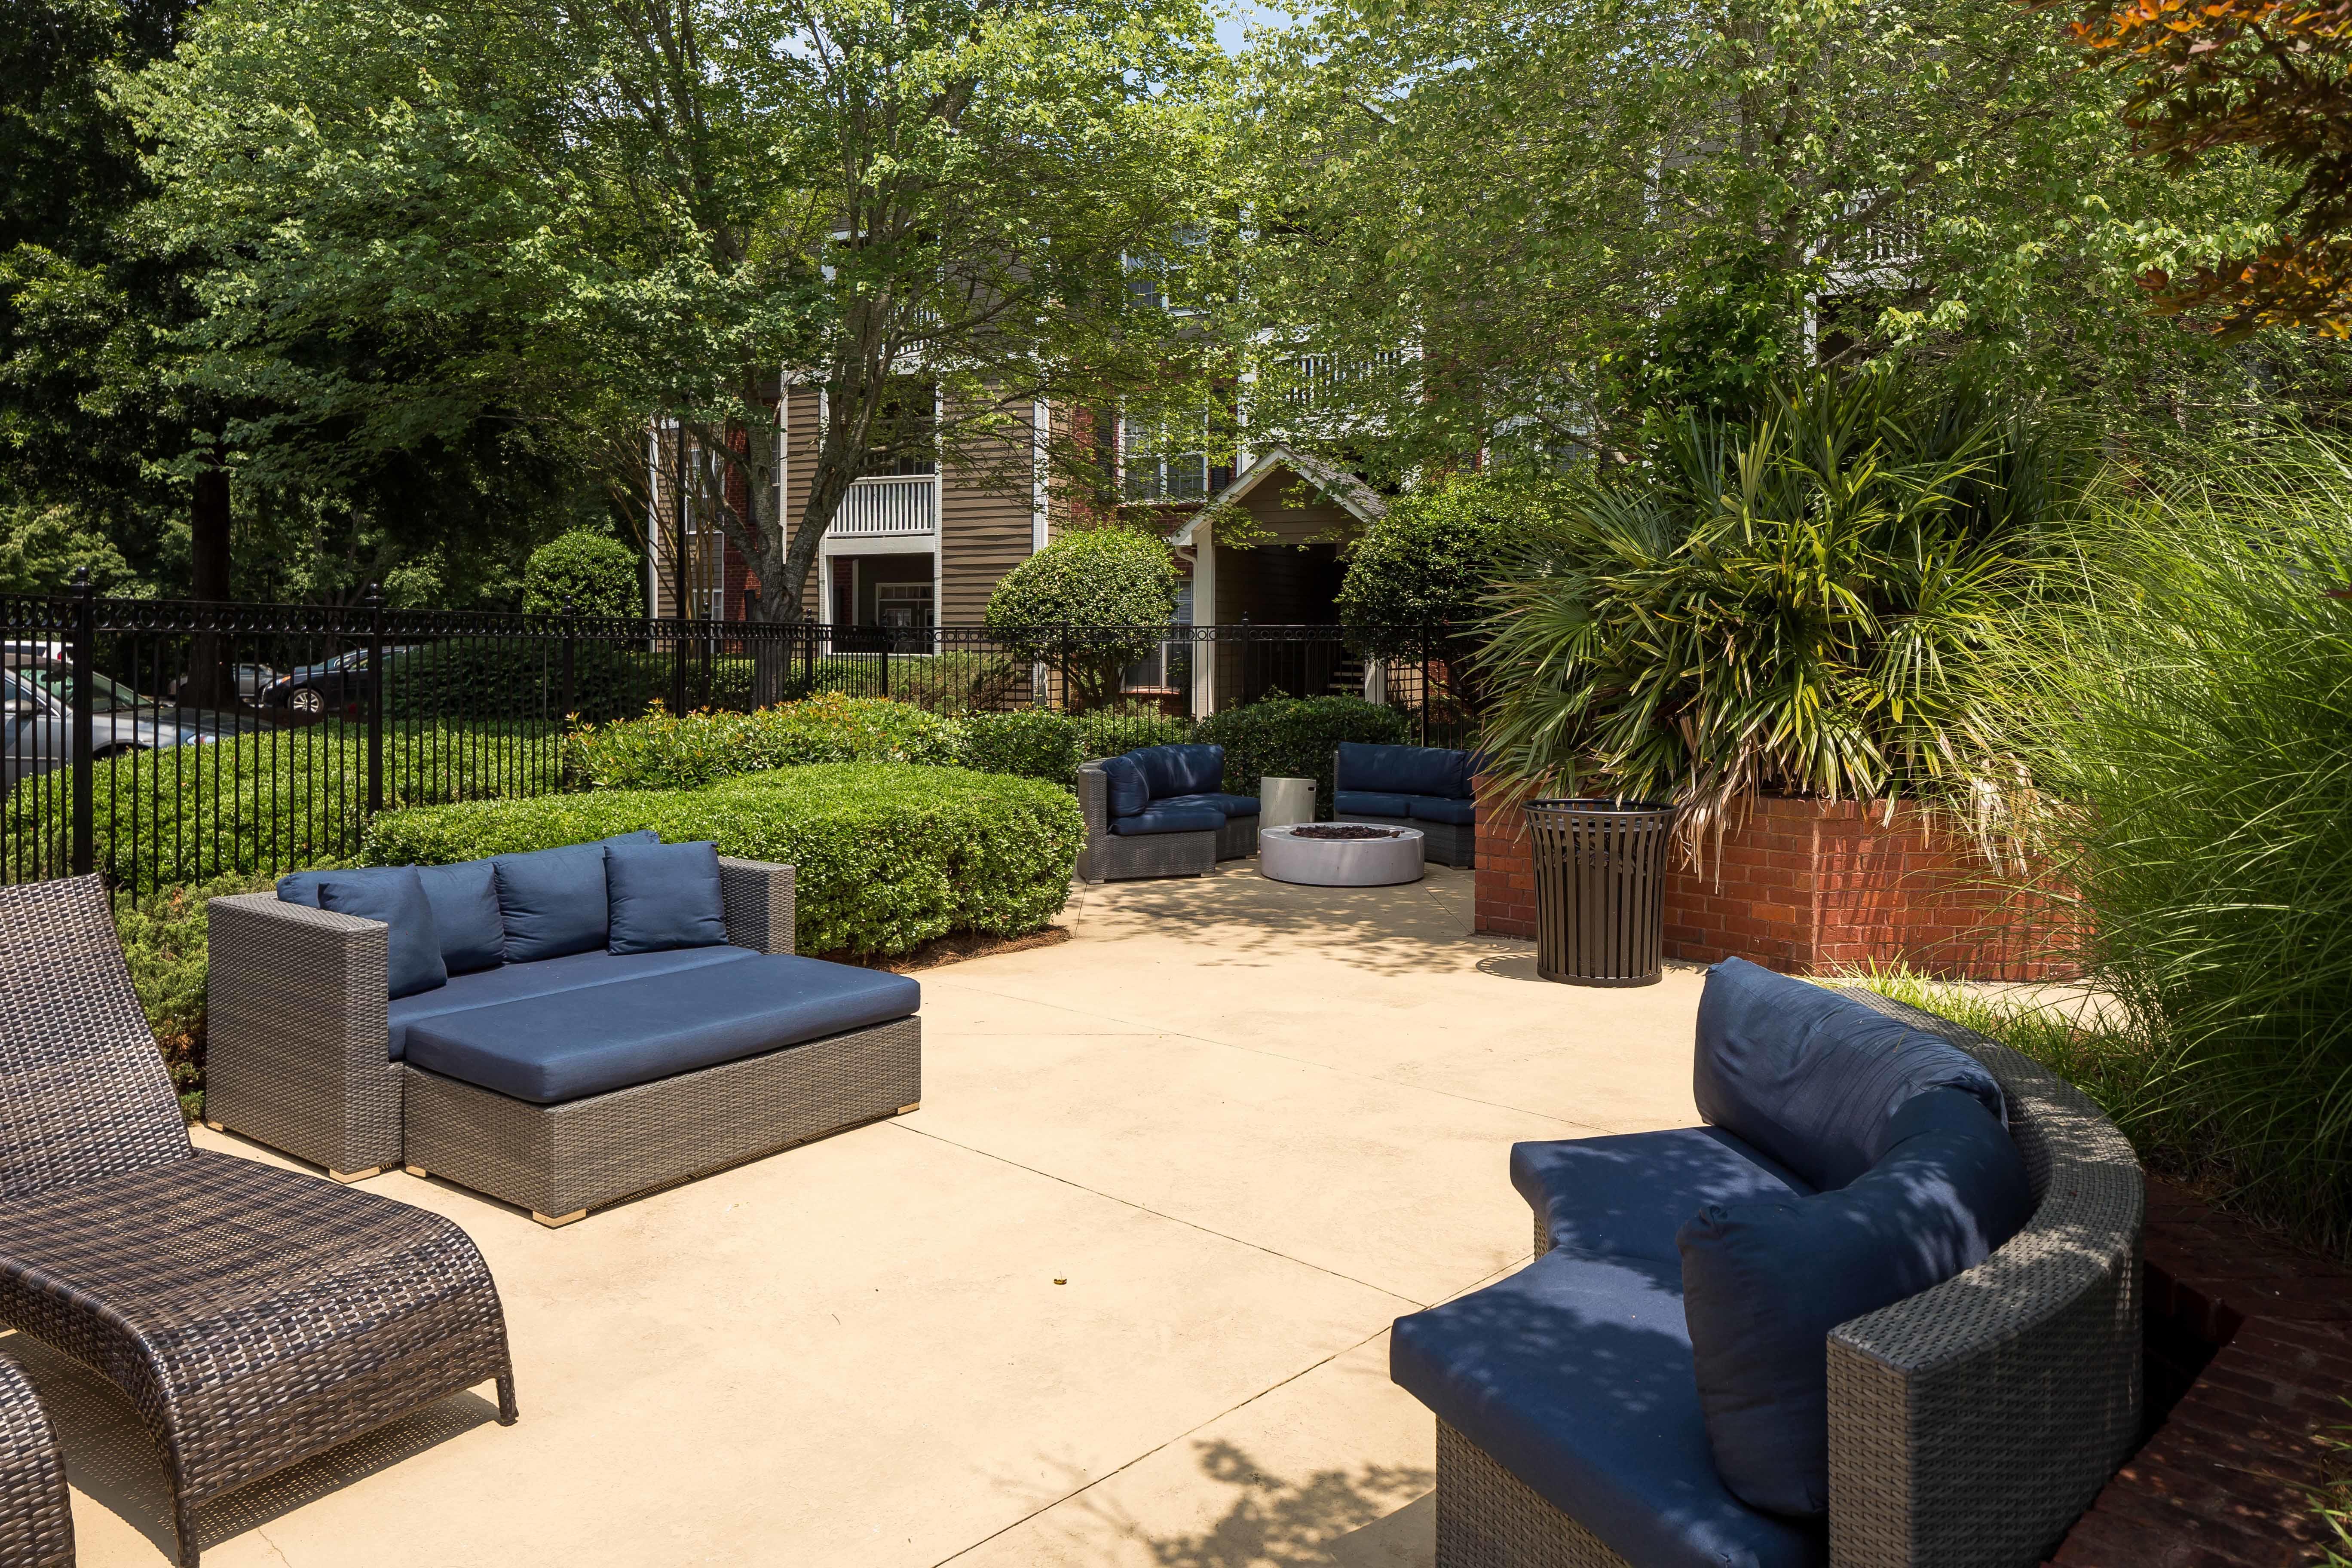 The Retreat at River Park Apartments image 14